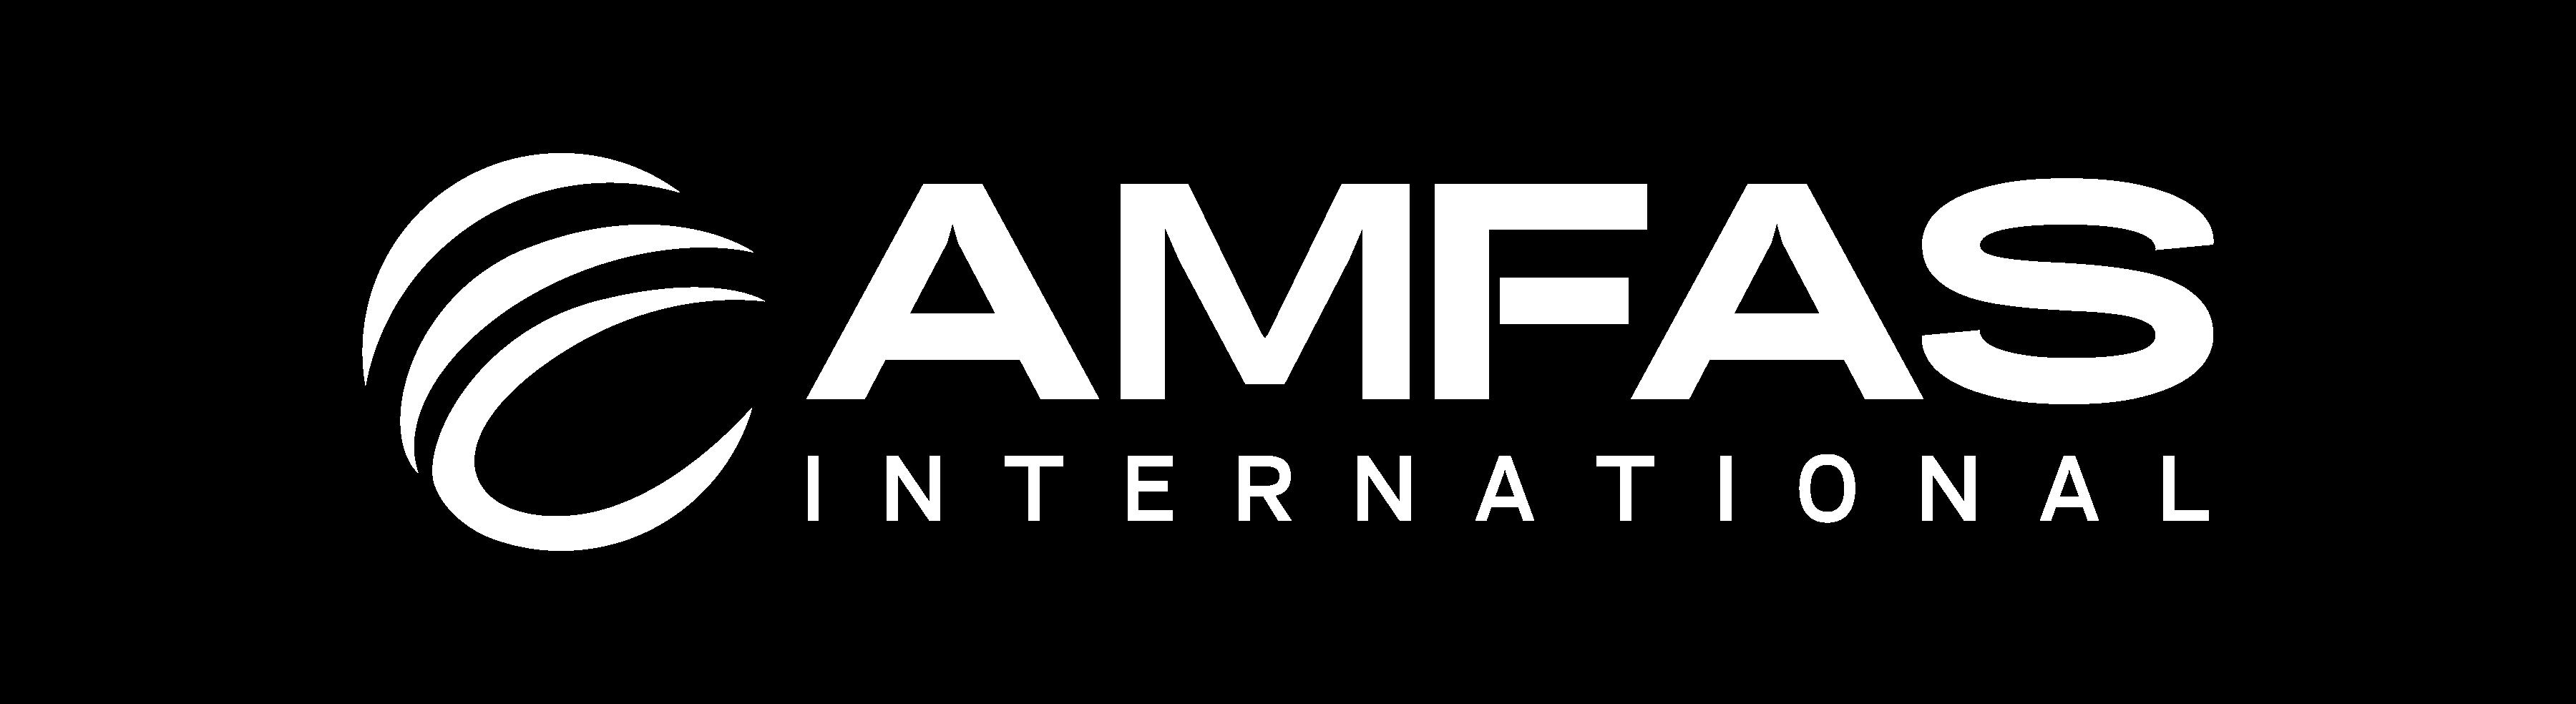 AMFAS